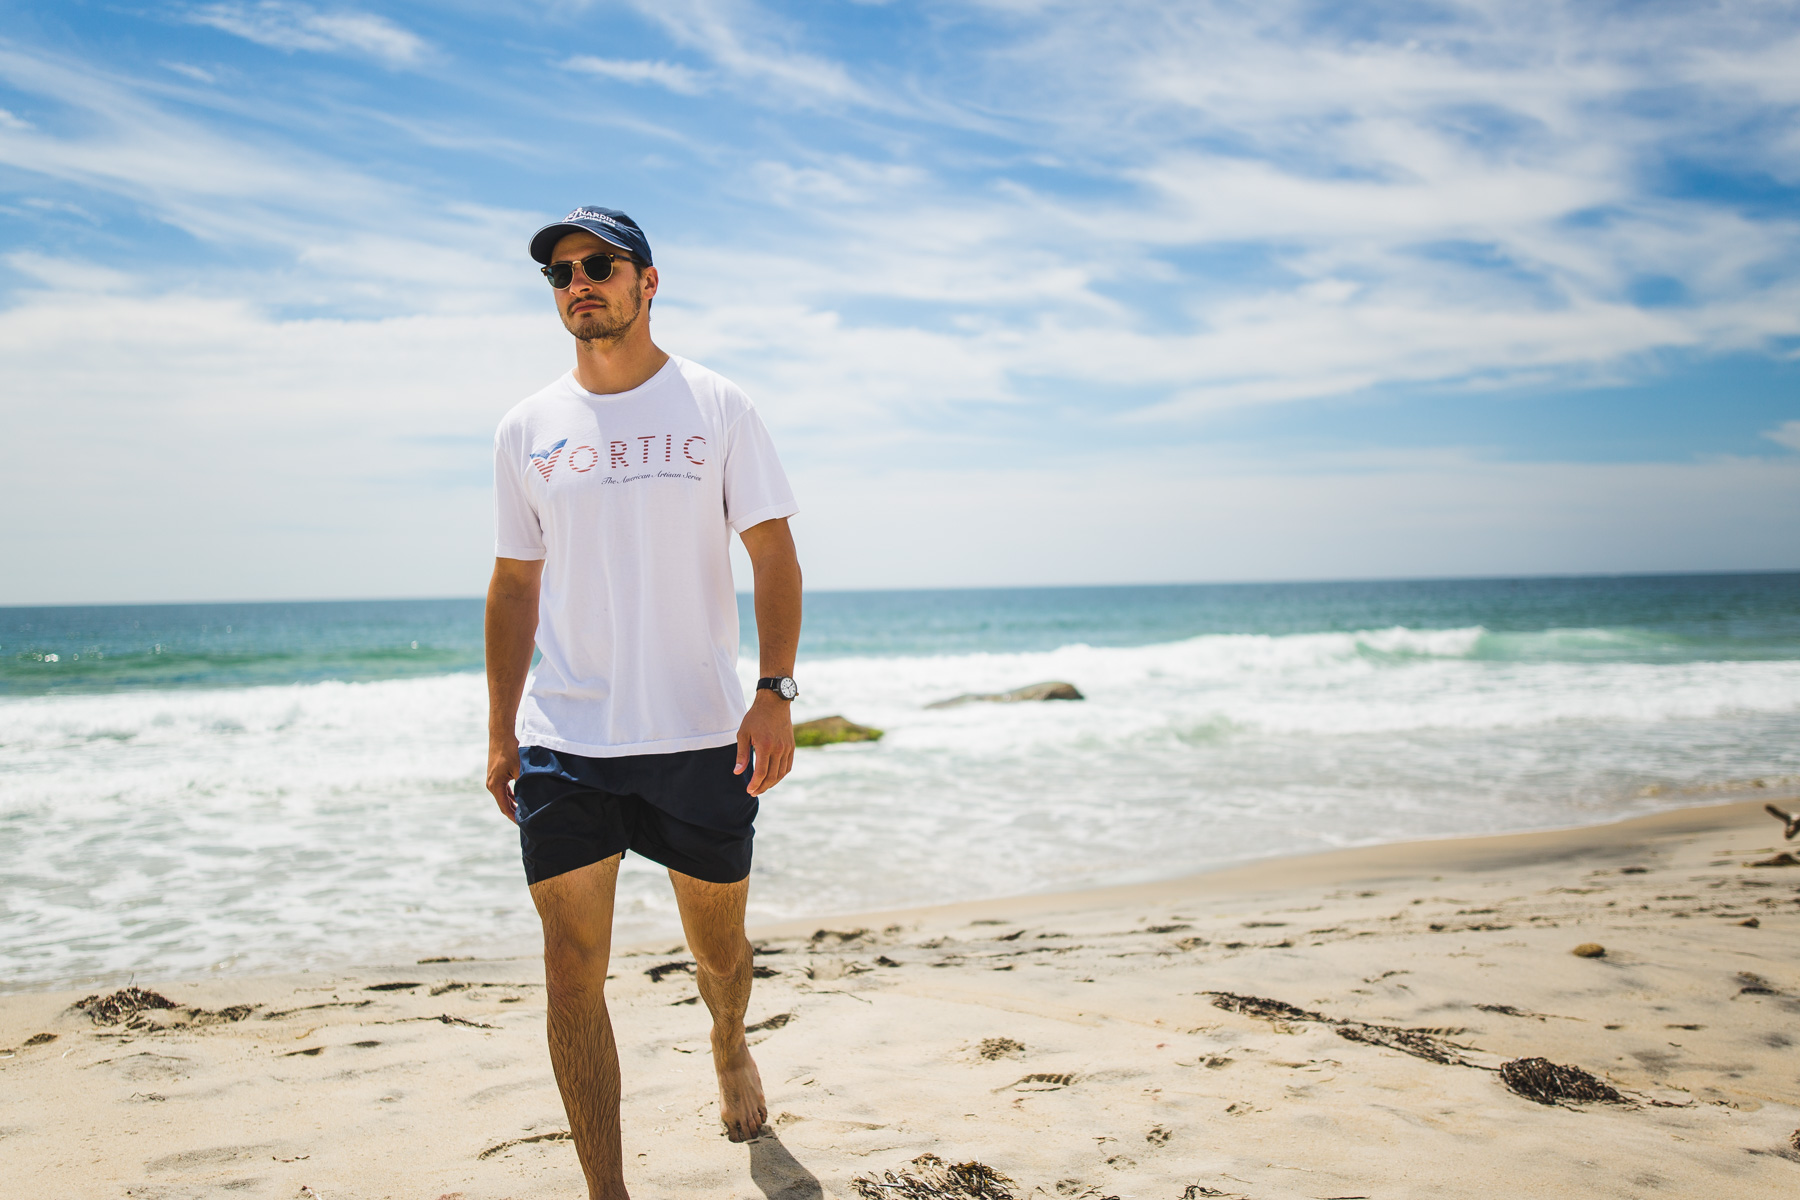 20160724.vortic-web.Gay Head Beach Photo Shoot.DS167297.jpg